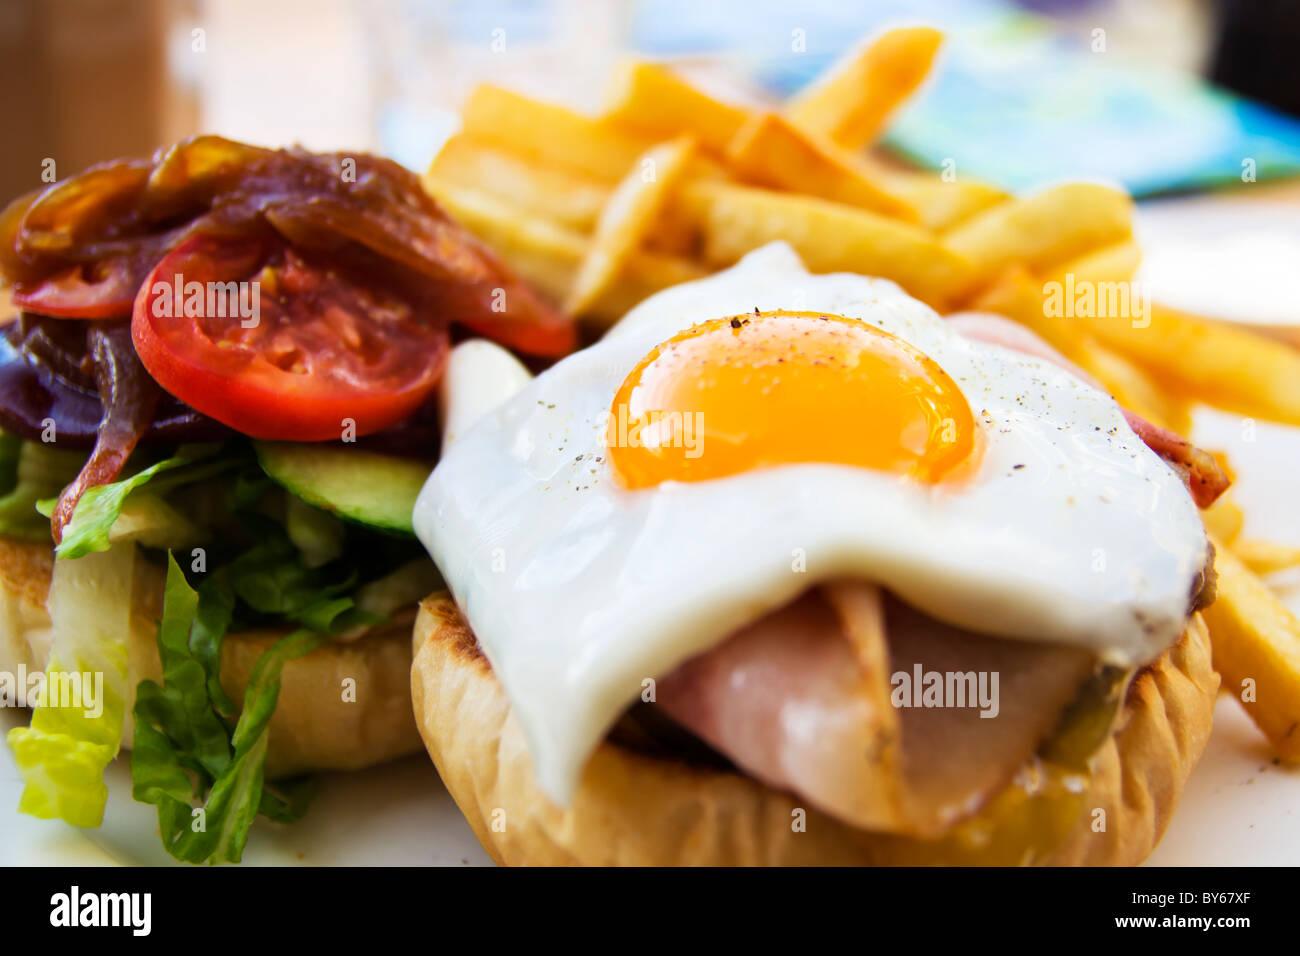 Wagyu beef burger avec des frites, bacon, jambon, oeufs, légumes et Photo Stock